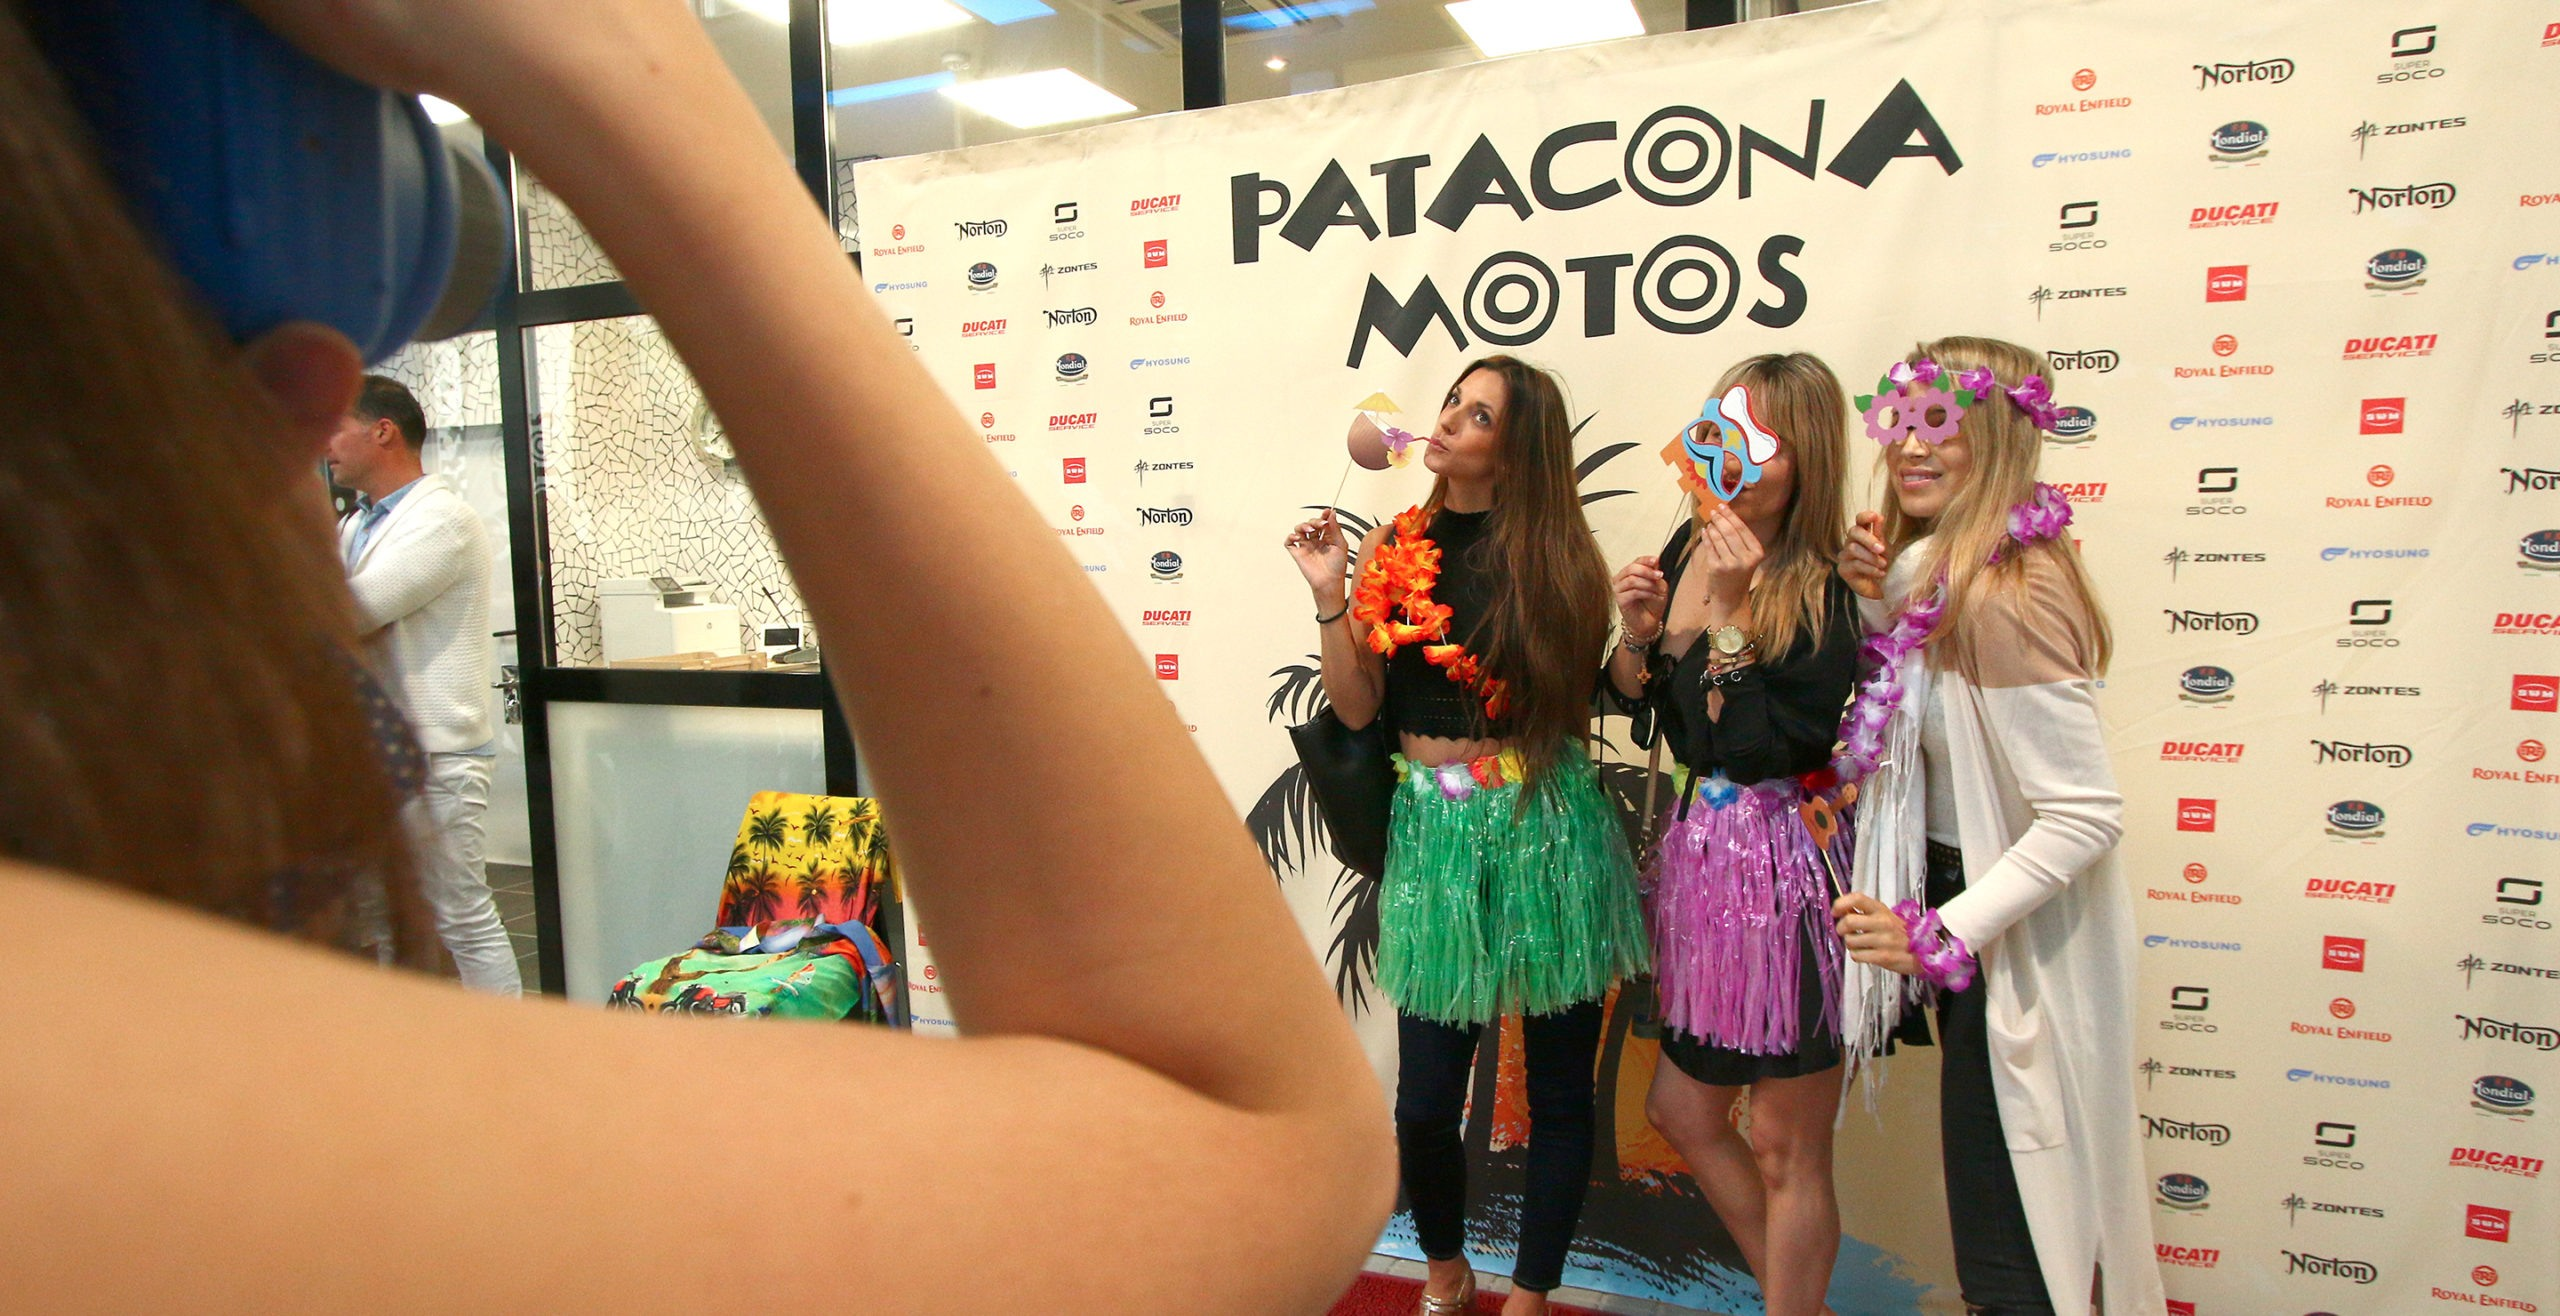 Chicas posando delante del Photocall de Patacona Motos